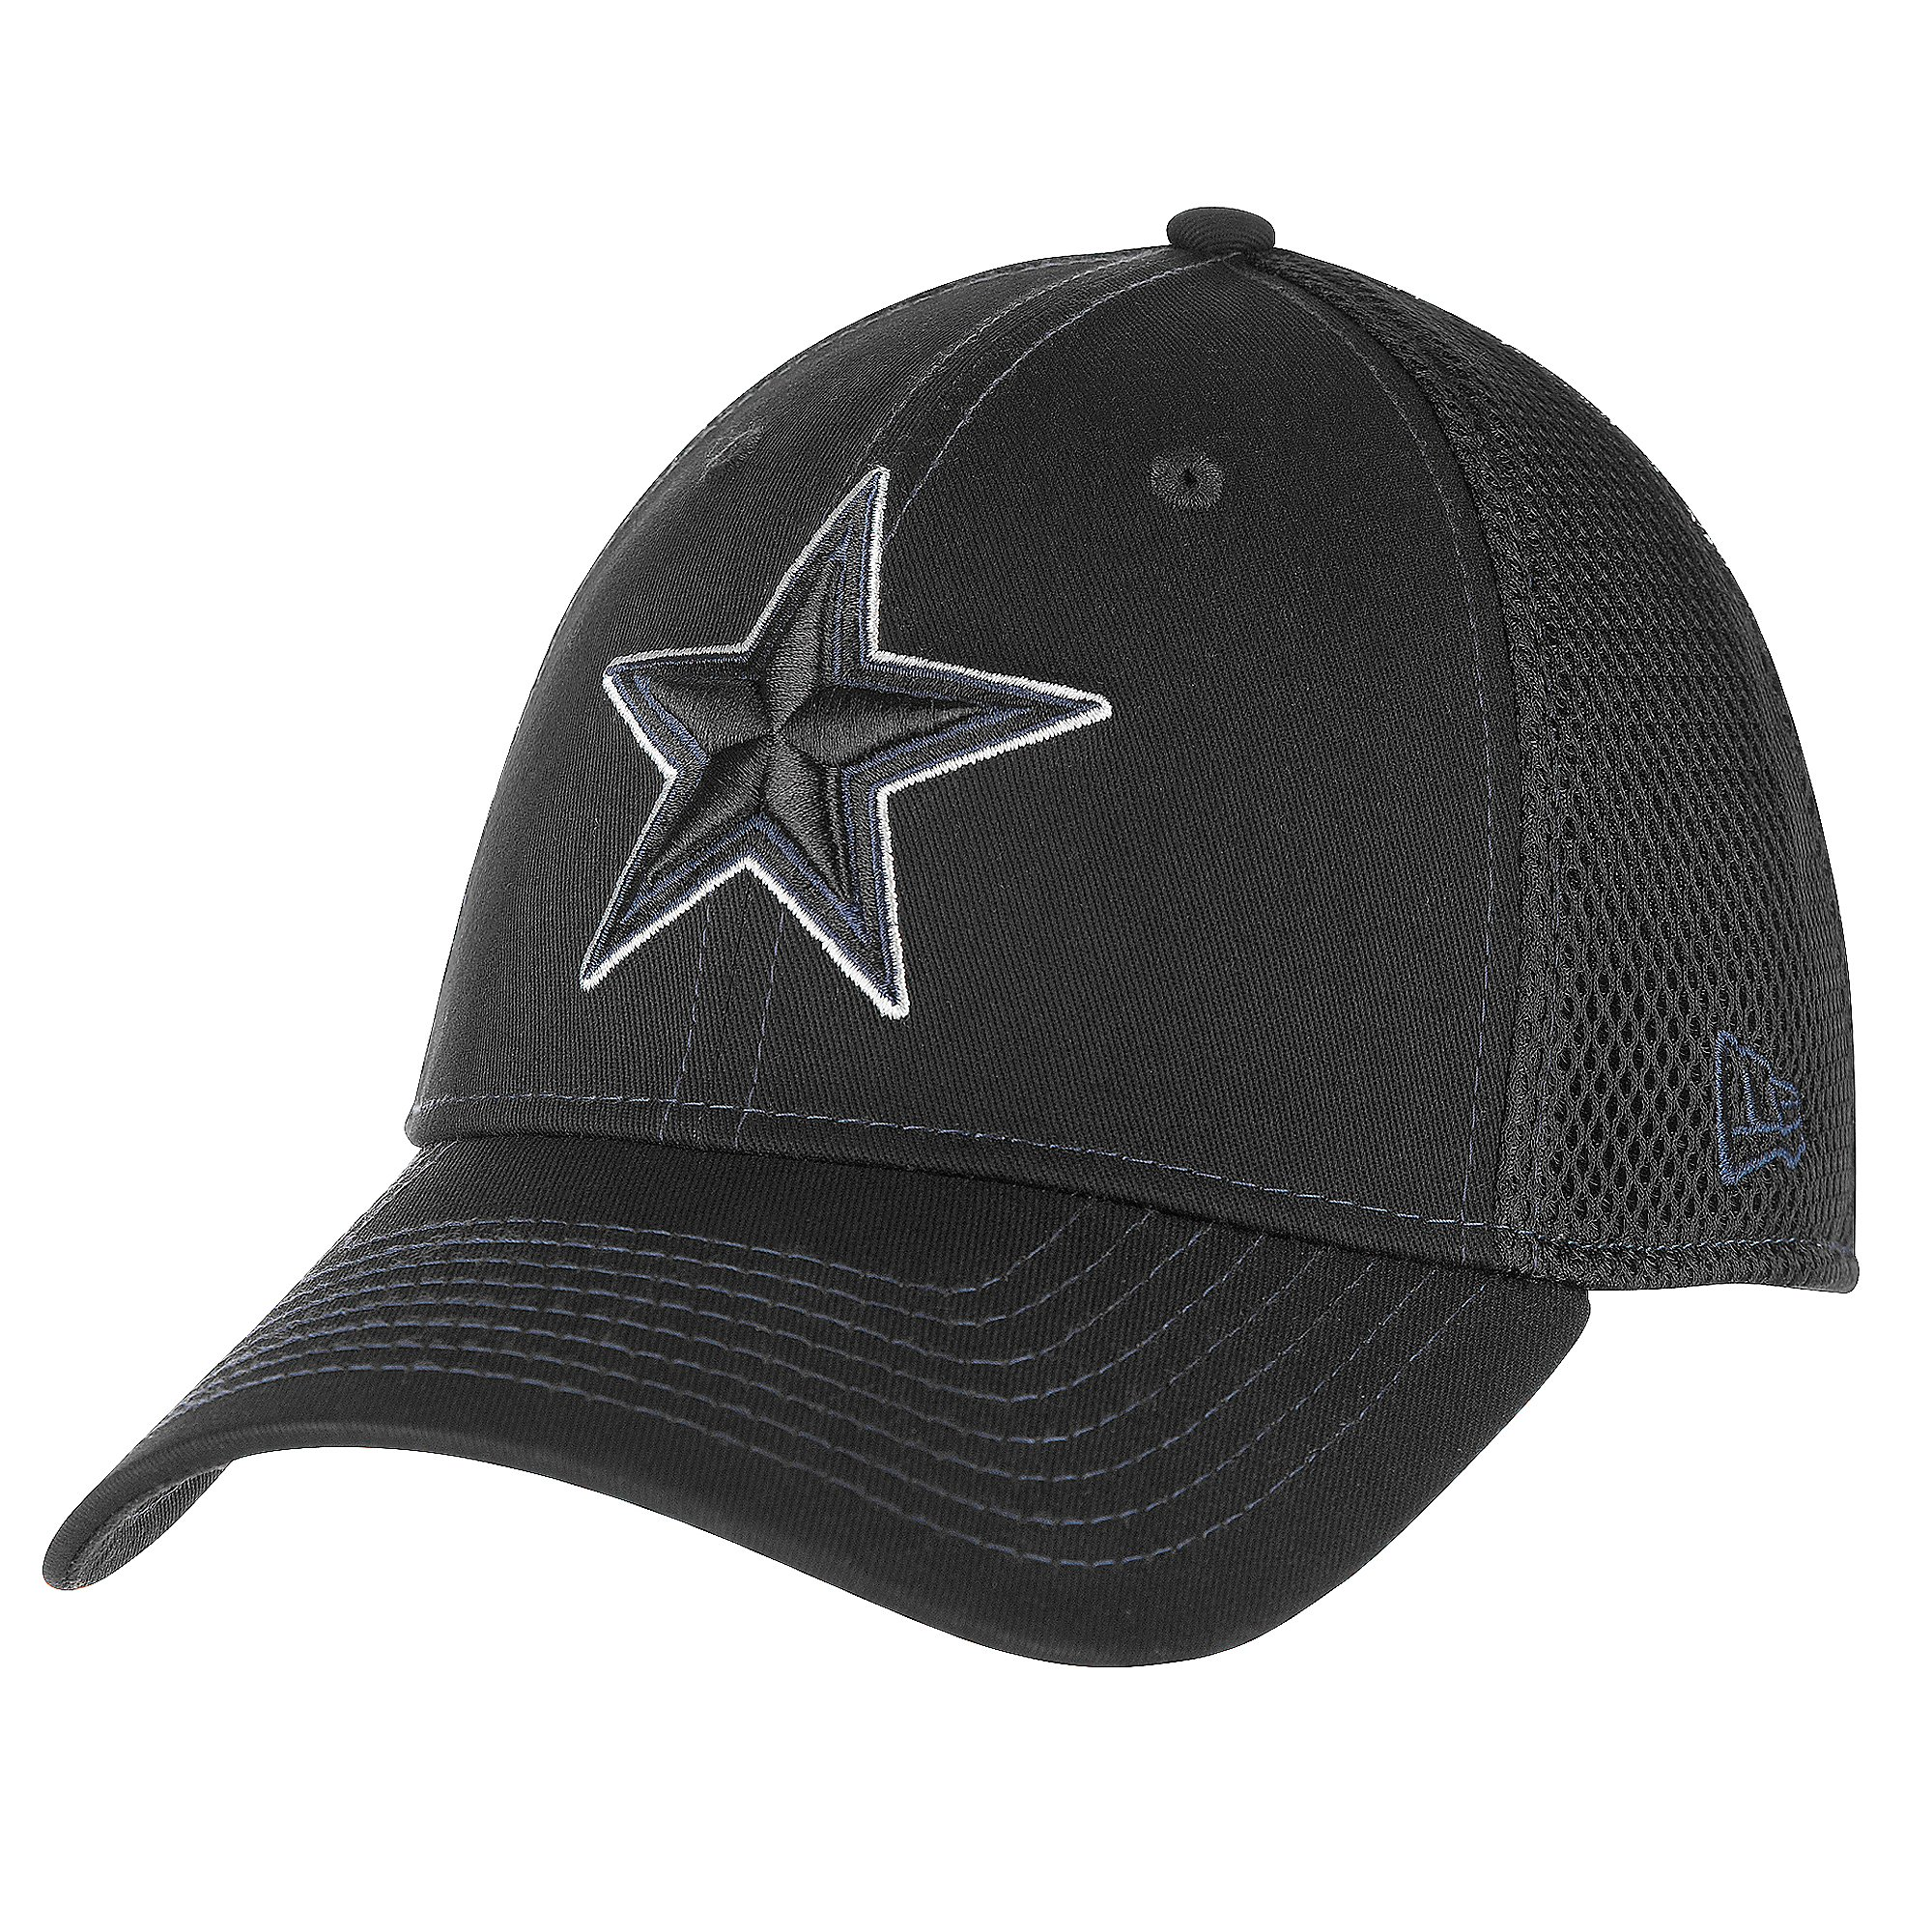 Dallas Cowboys New Era Shock Stitch Neo 39Thirty Hat